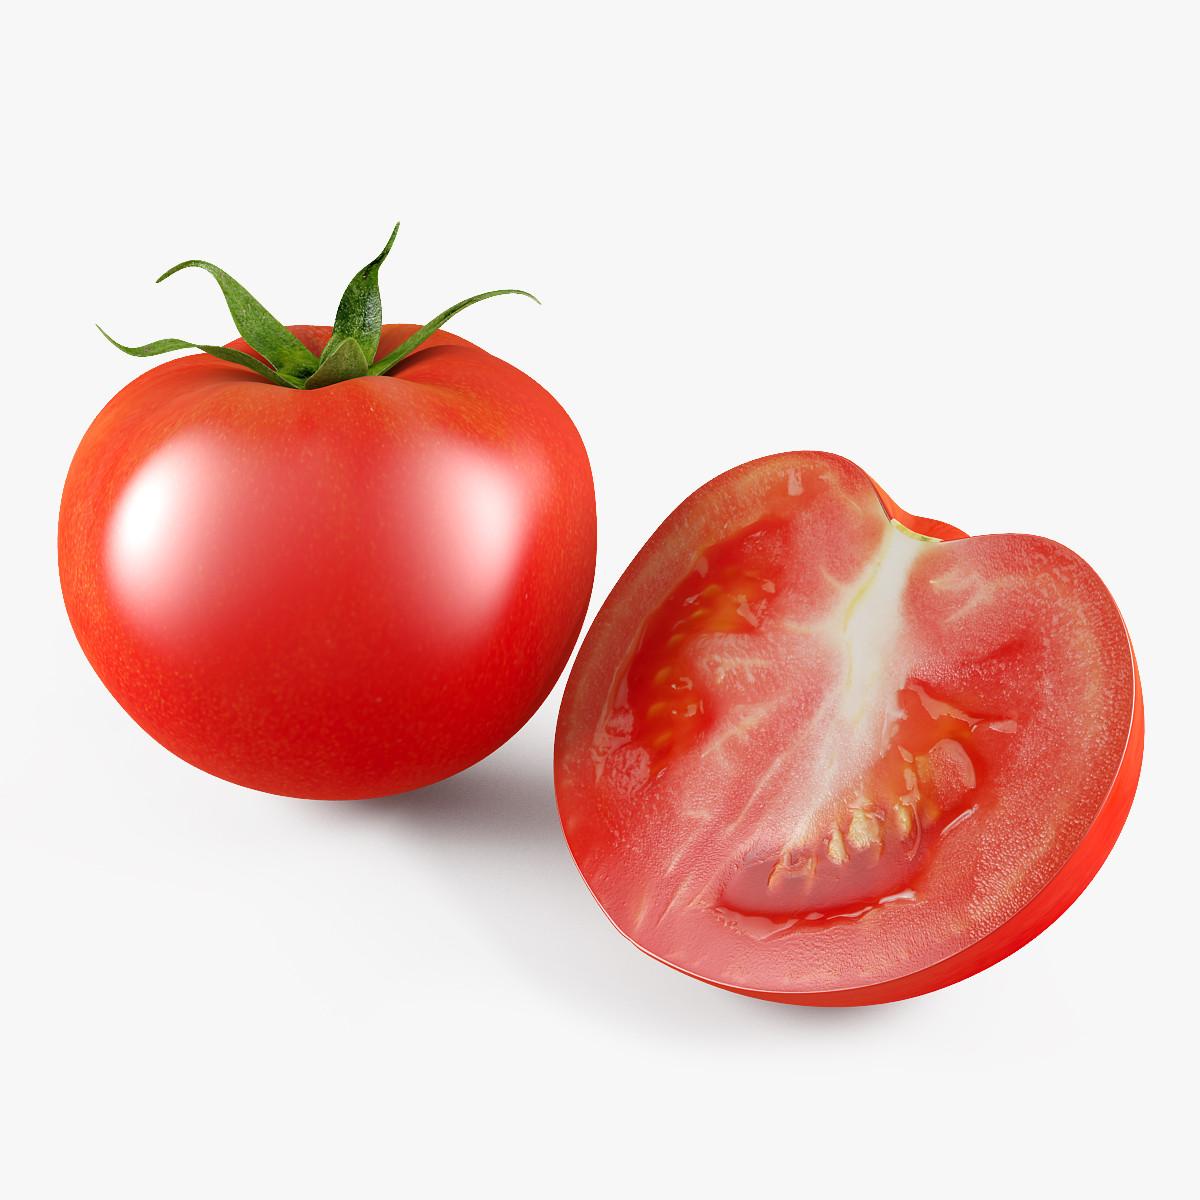 tomato1_1_1.jpg